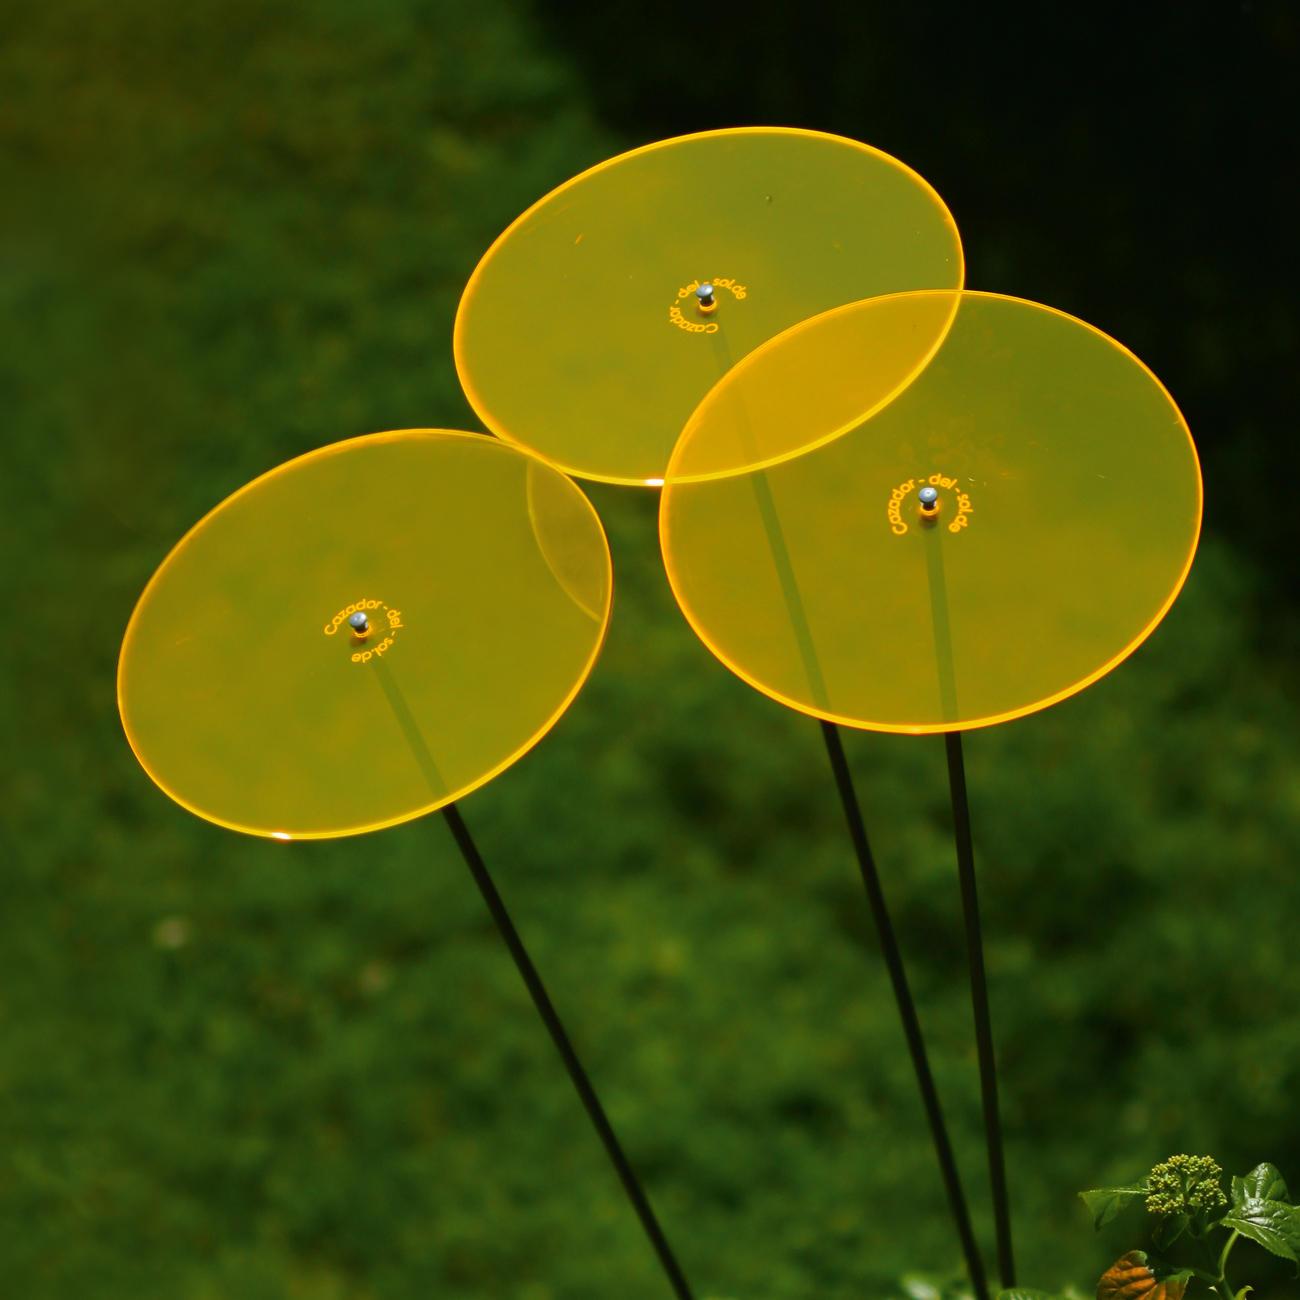 Cazador Del Sol Sonnenfänger Tres Gelb 3er Set 175 M Hoch